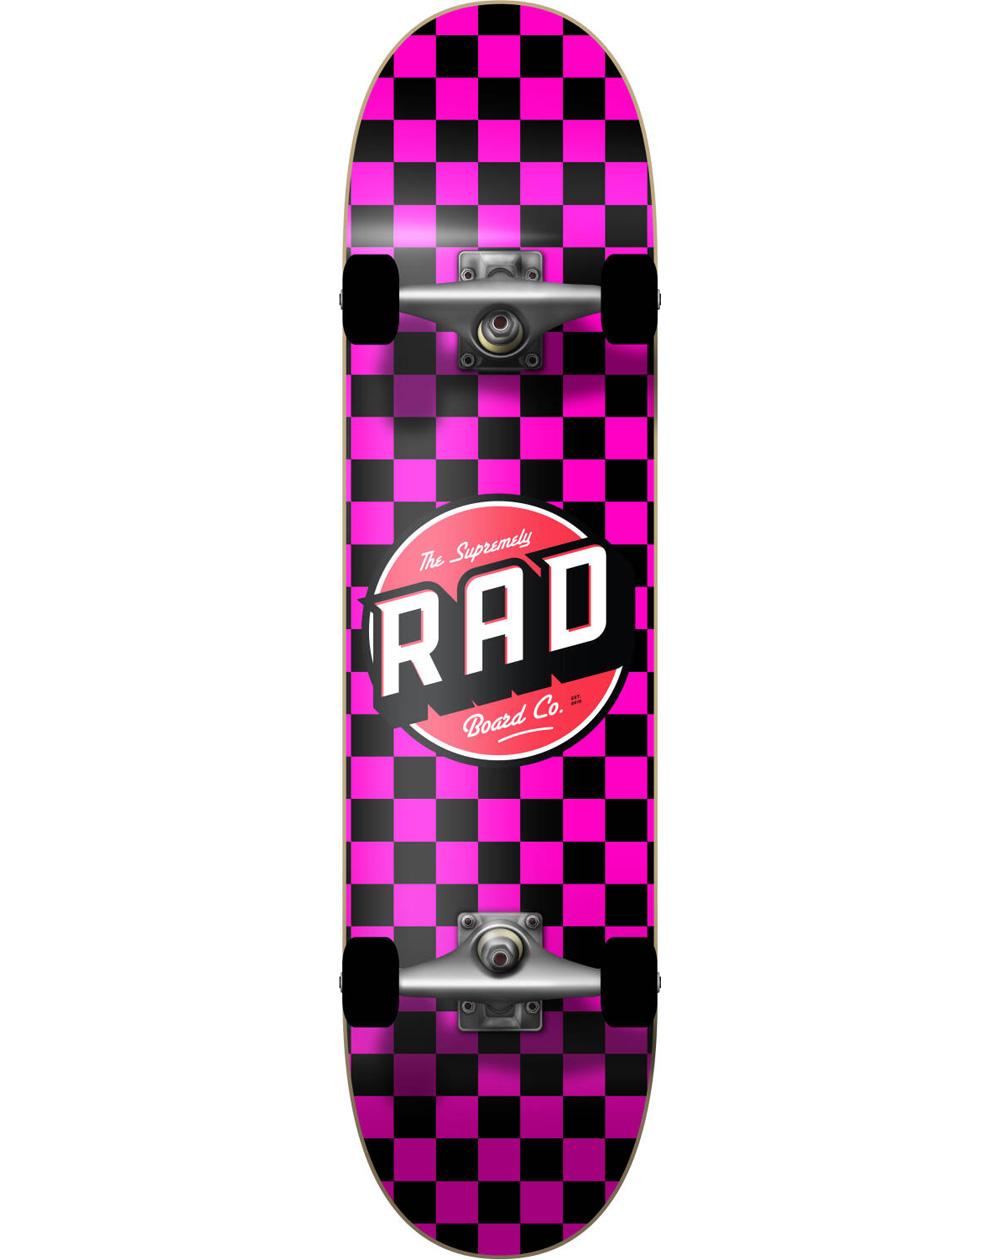 "Rad Checkers 7.75"" Complete Skateboard Black/Pink"